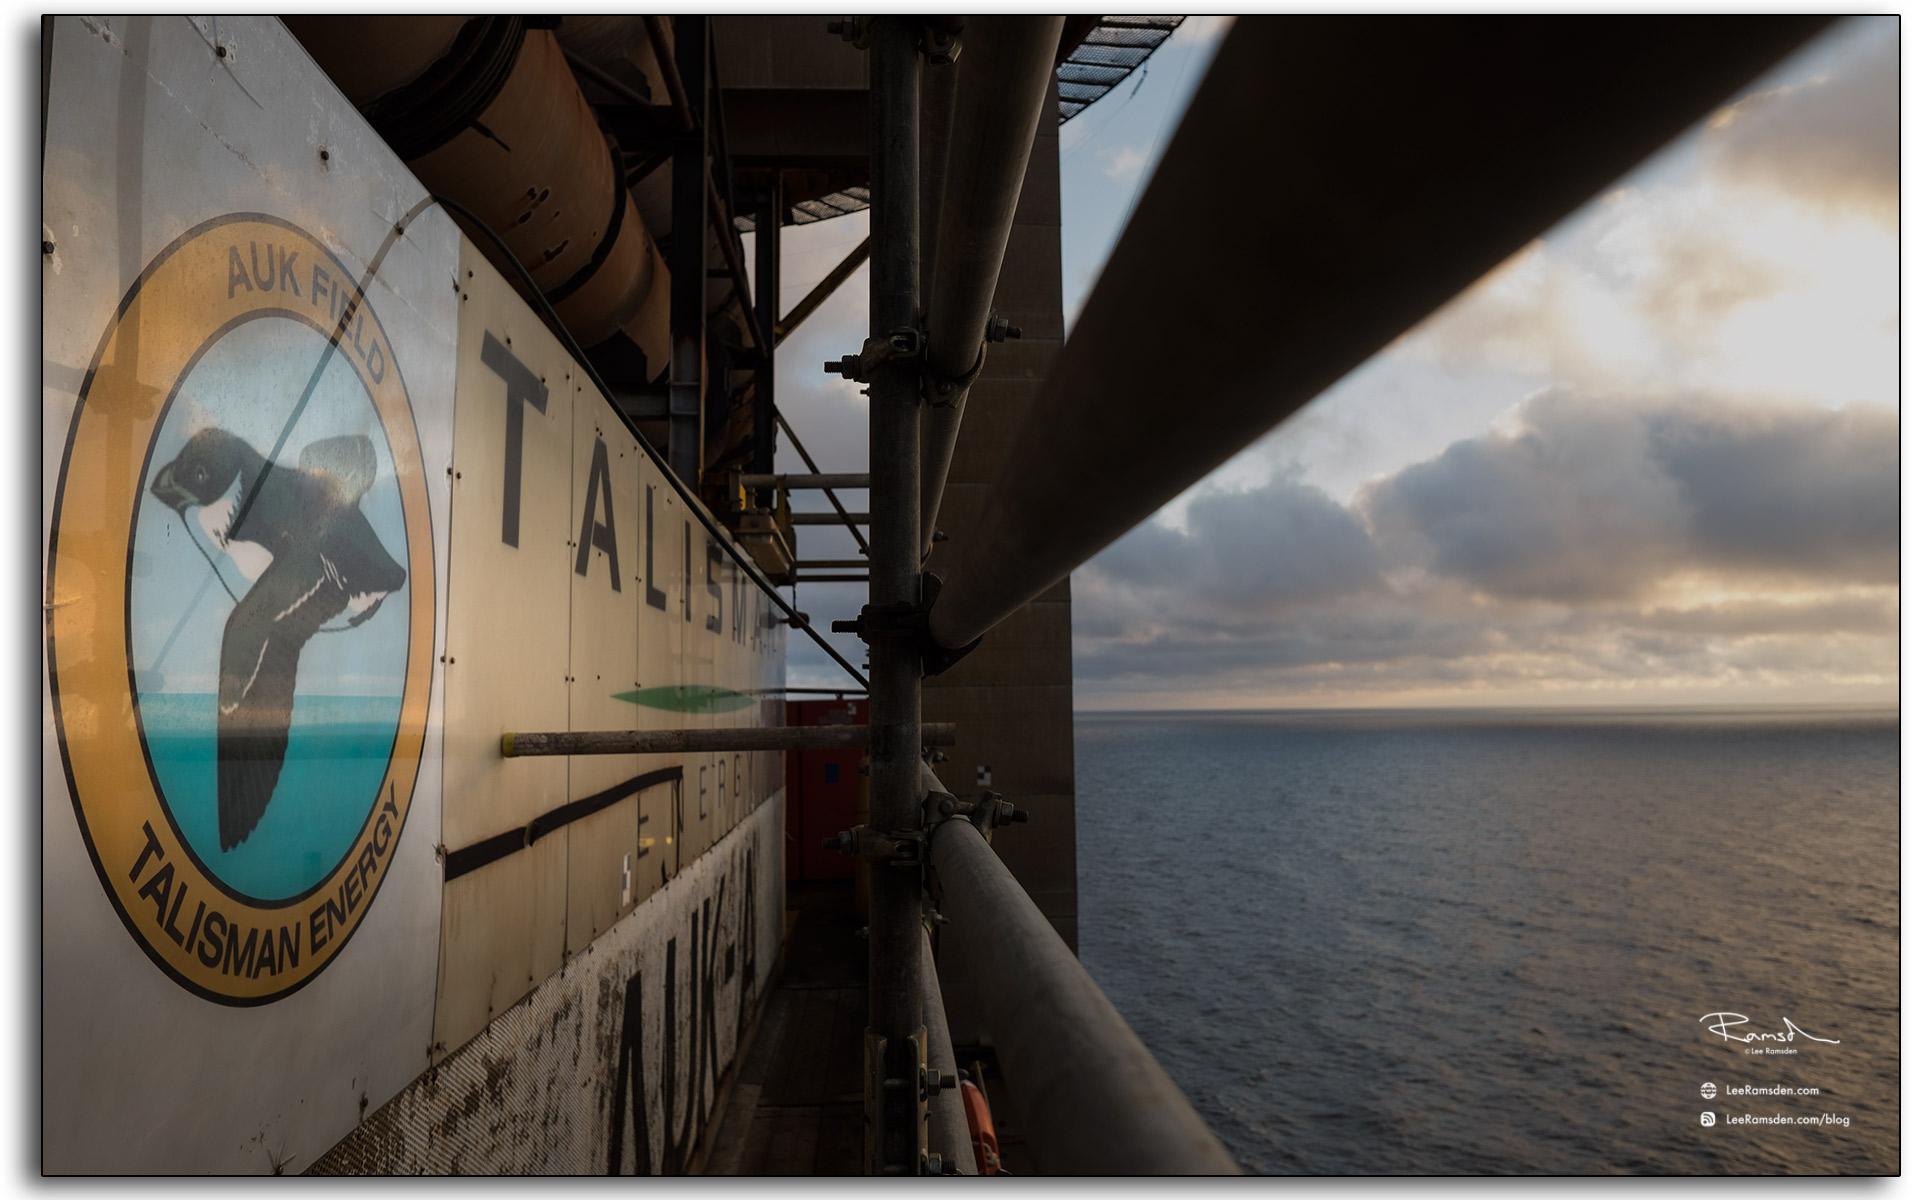 02 Talisman AUK sea bird north oil gas rig workers rotation exploration drilling platform Aberdeen